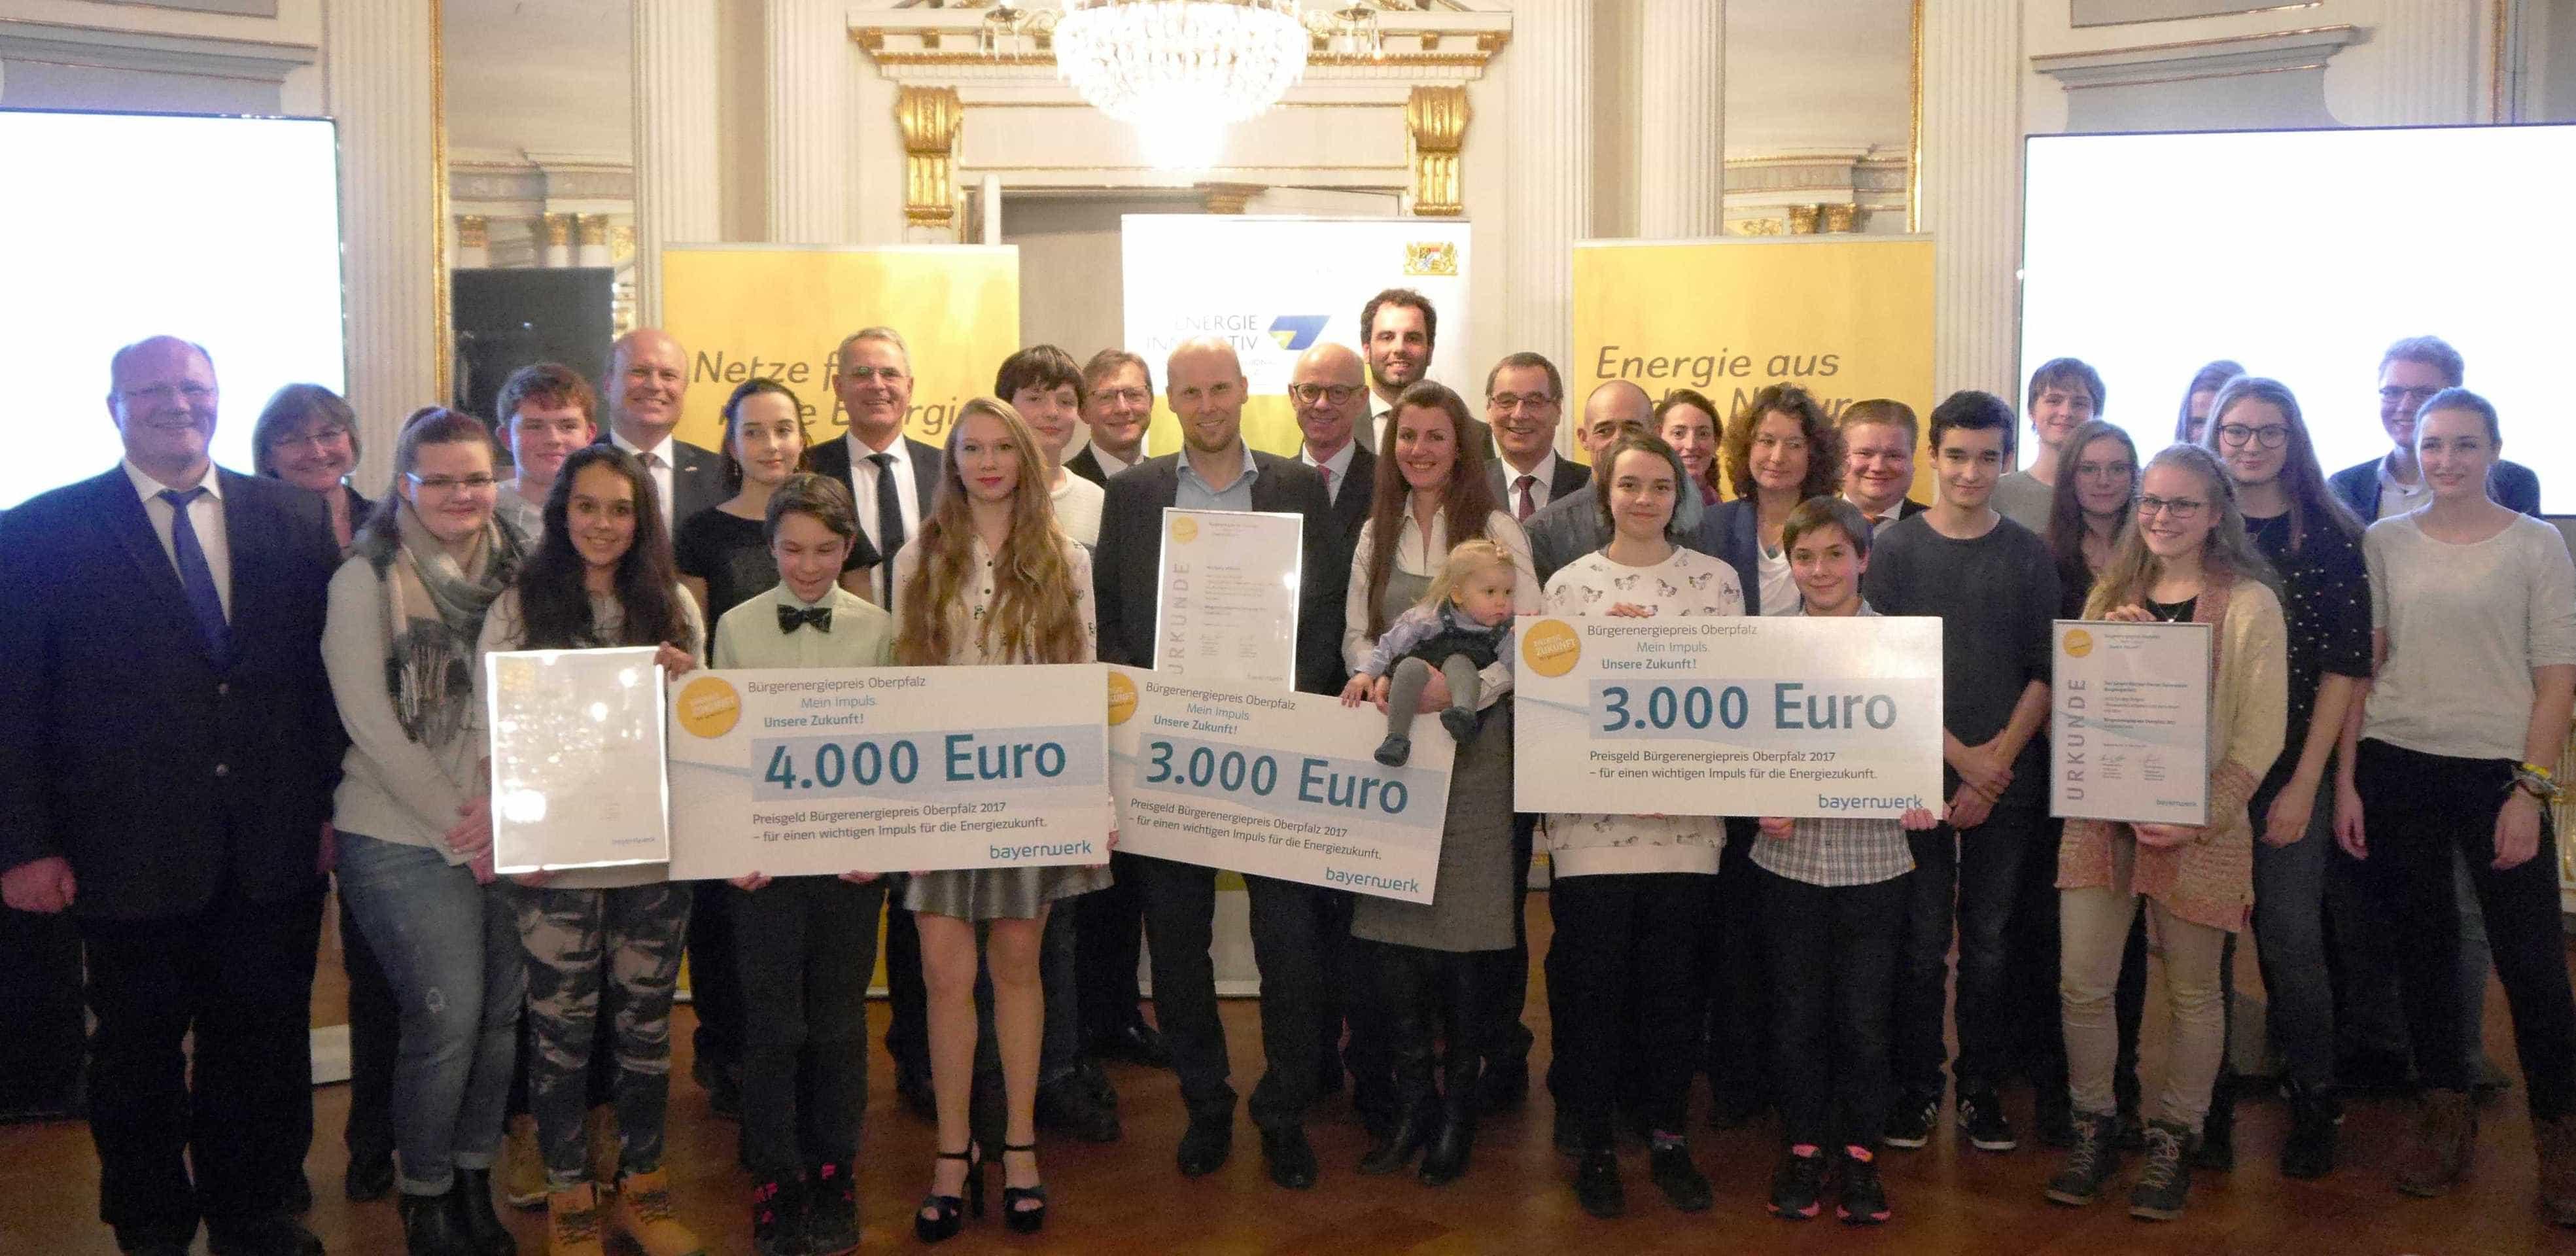 Bayernwerk verleiht Bürgerenergiepreis Oberpfalz 2017